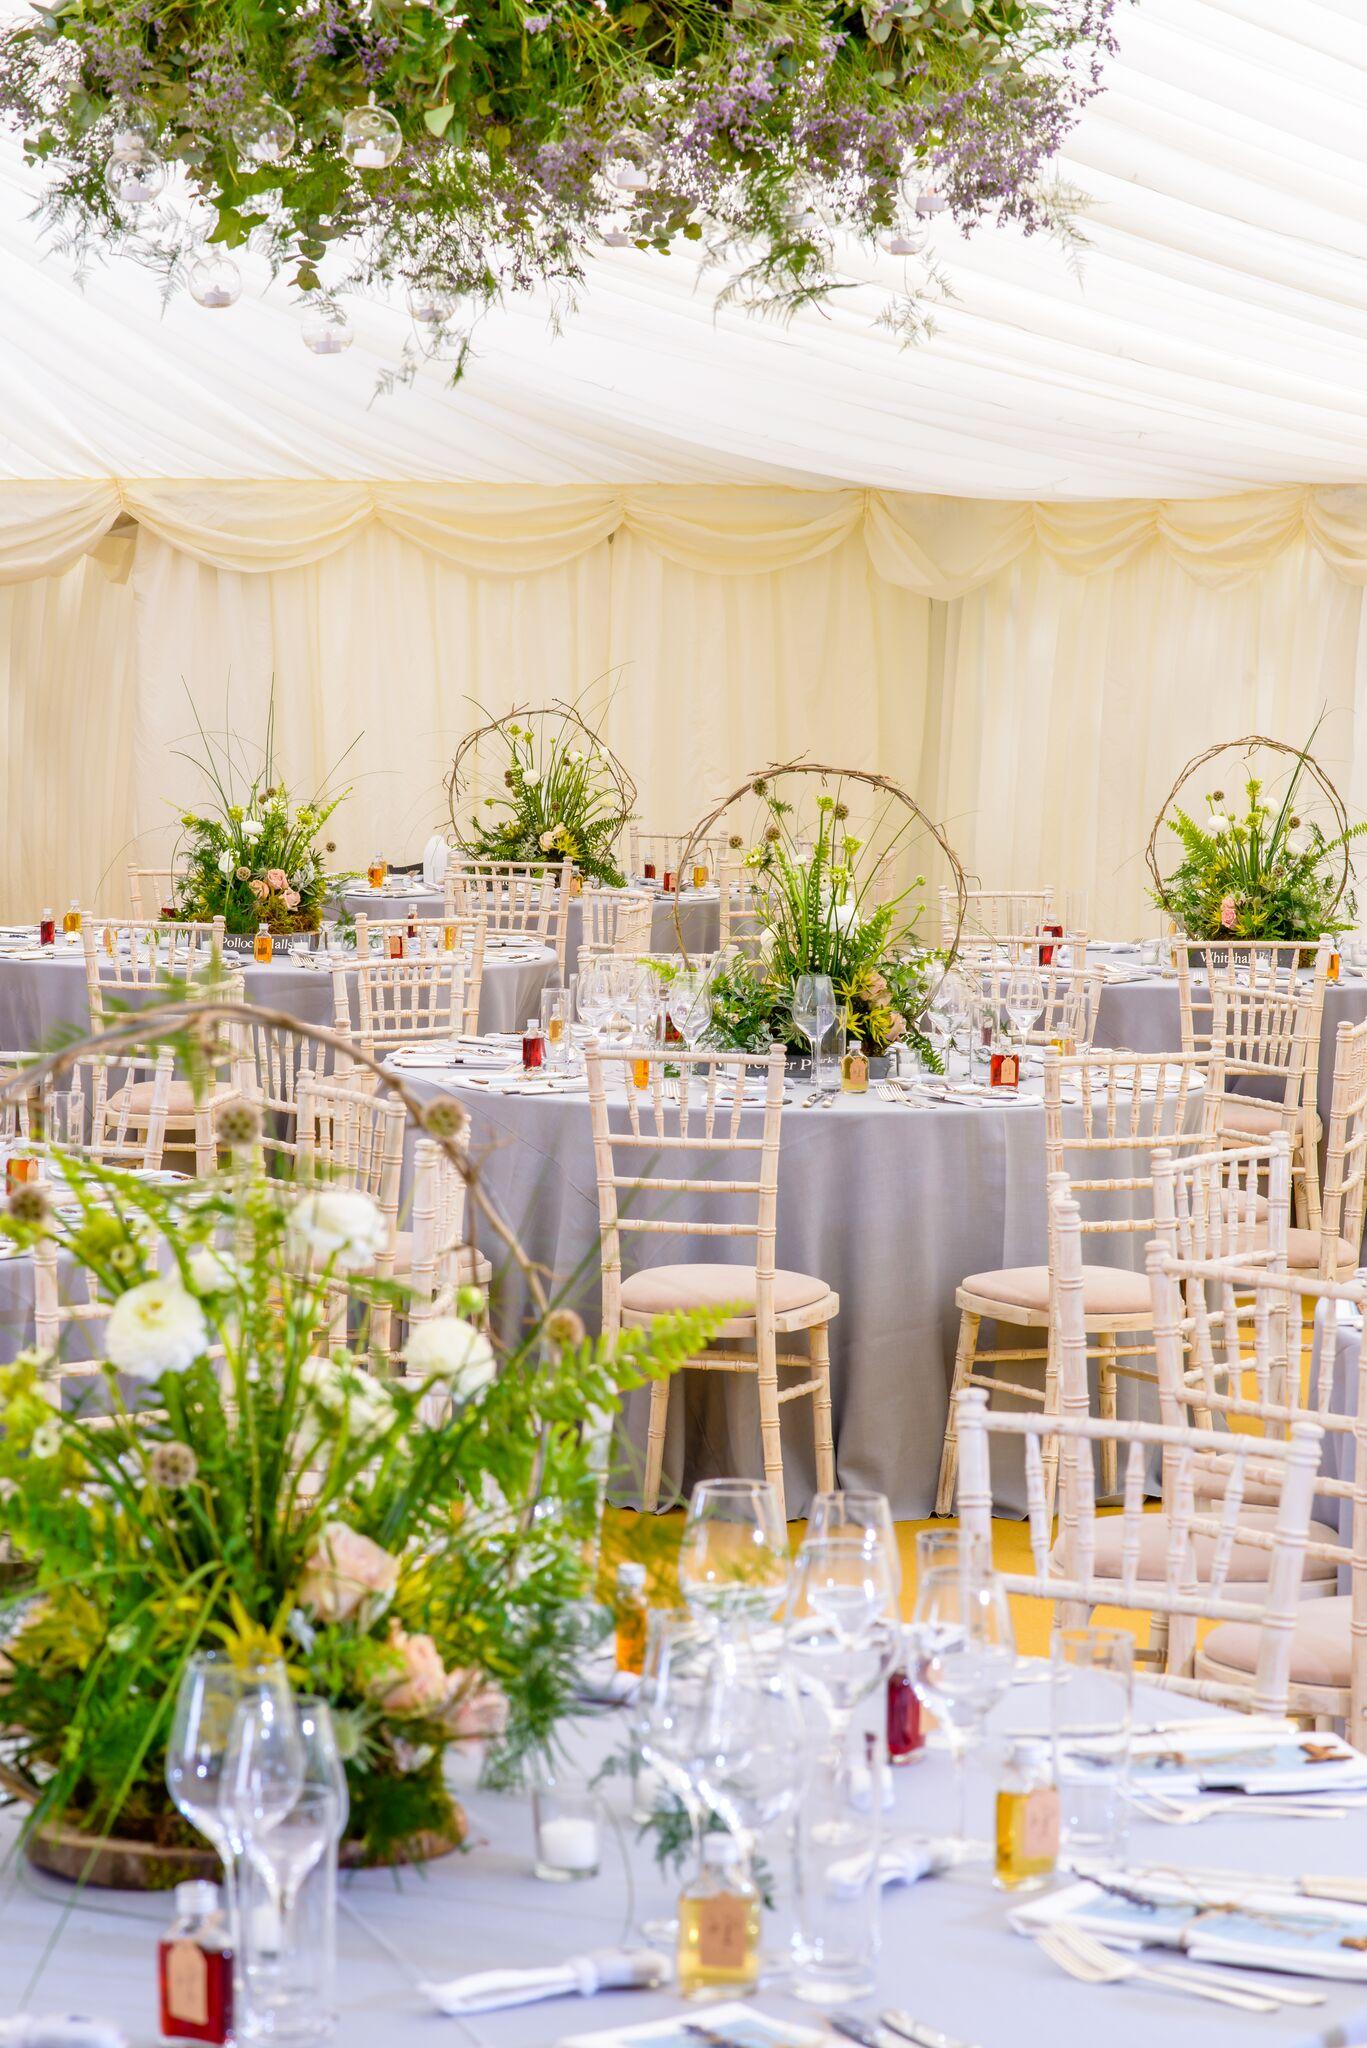 Get-Knotted.net Wedding at Broxmouth Park - Table set up (image credit - kevingreenfield.com) (2)